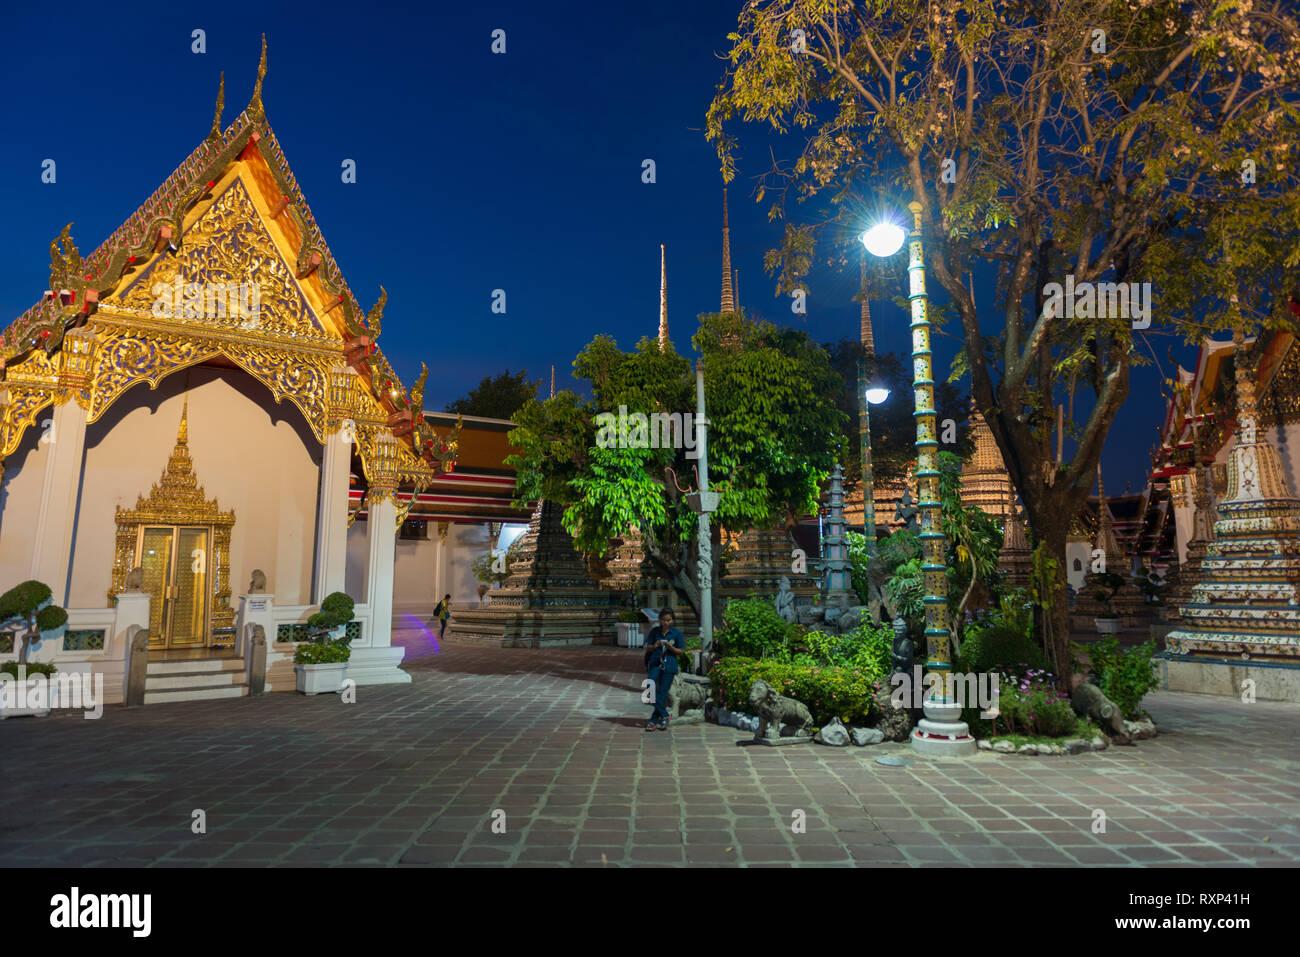 Night photo of Buddist temple Phra Maha Chedi in Bangkok, Thailand Stock Photo